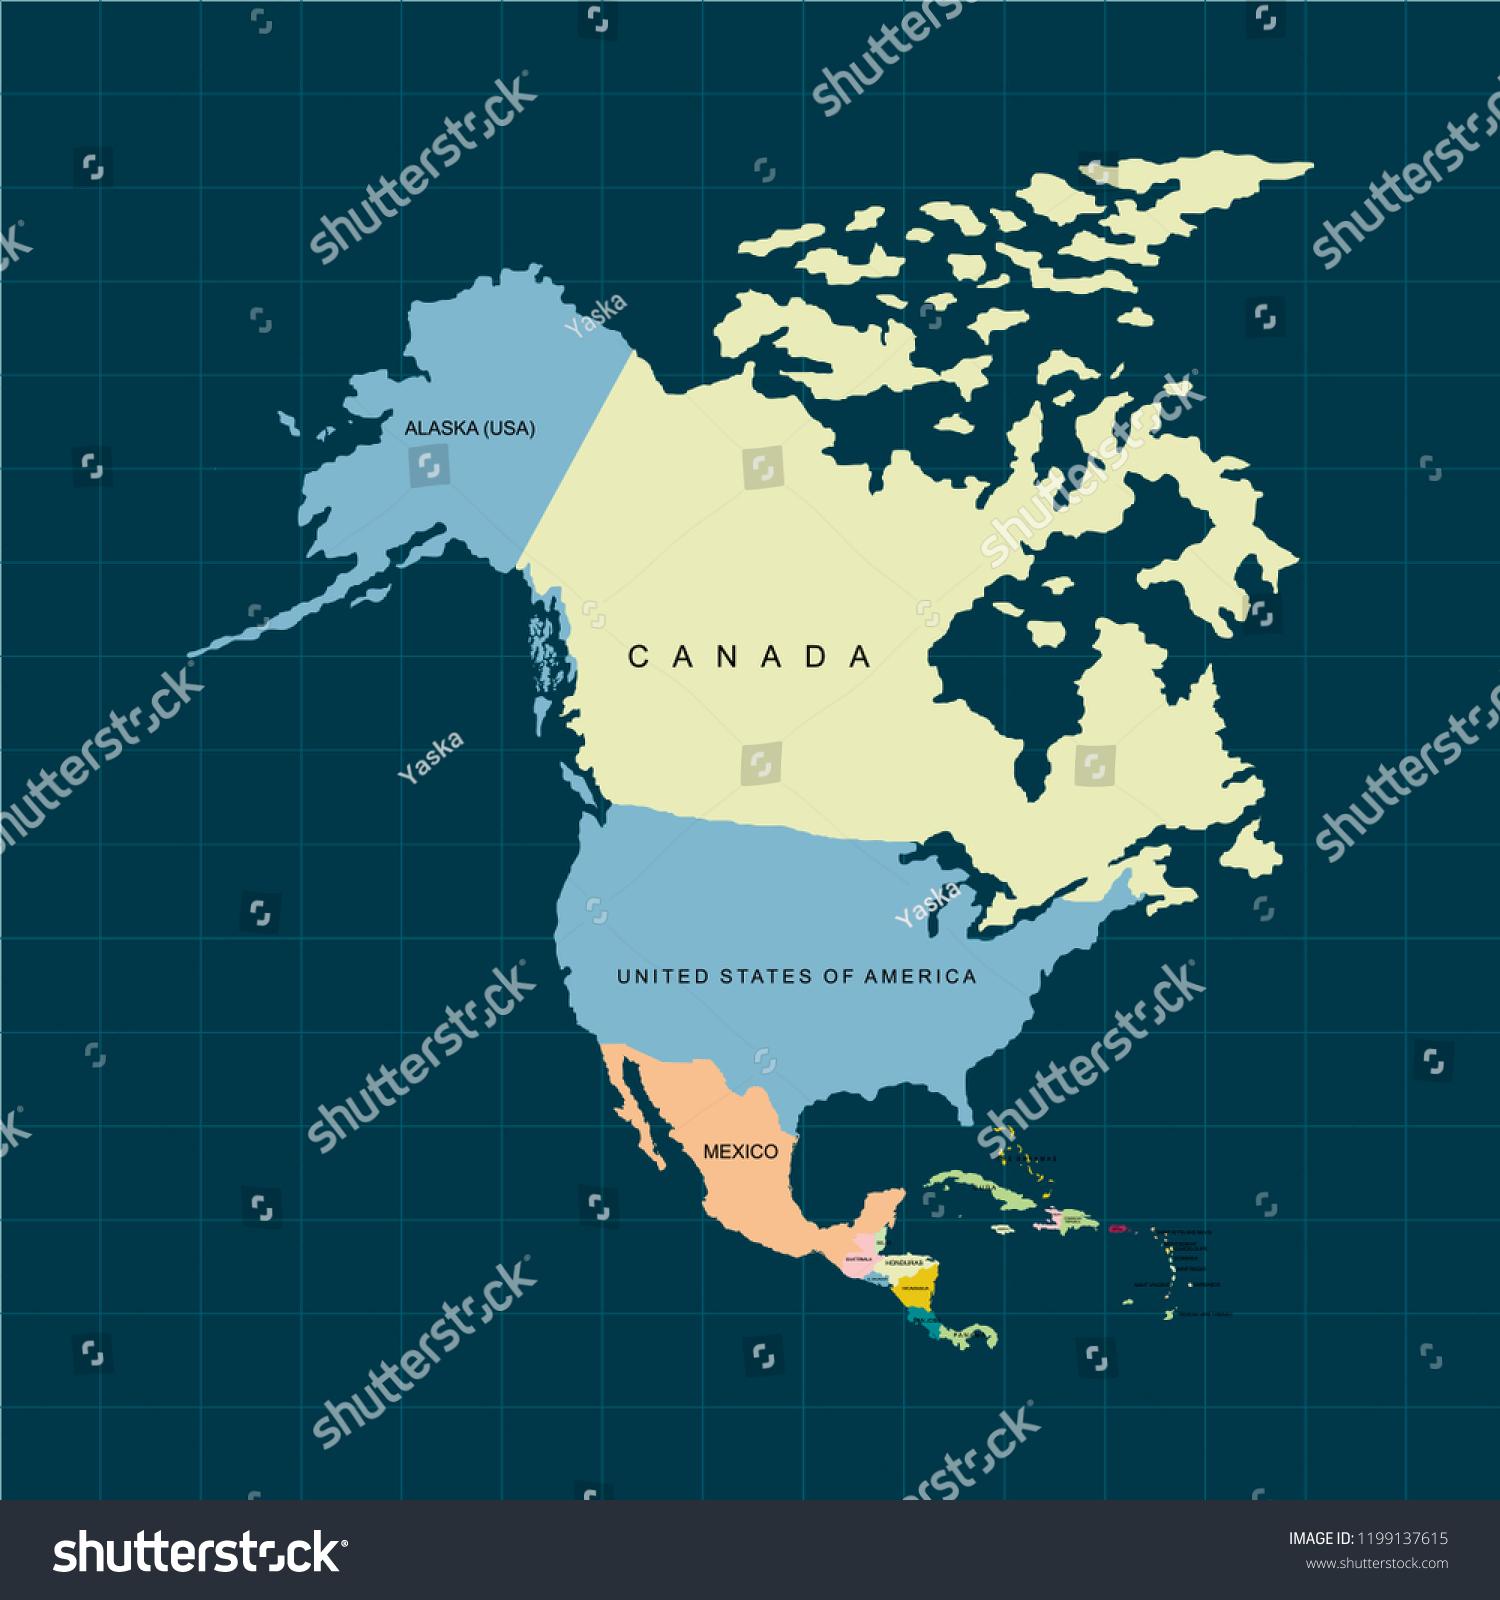 Map Of Usa And Canada And Alaska.Territory North America Continent Canada Alaska Stock Vector